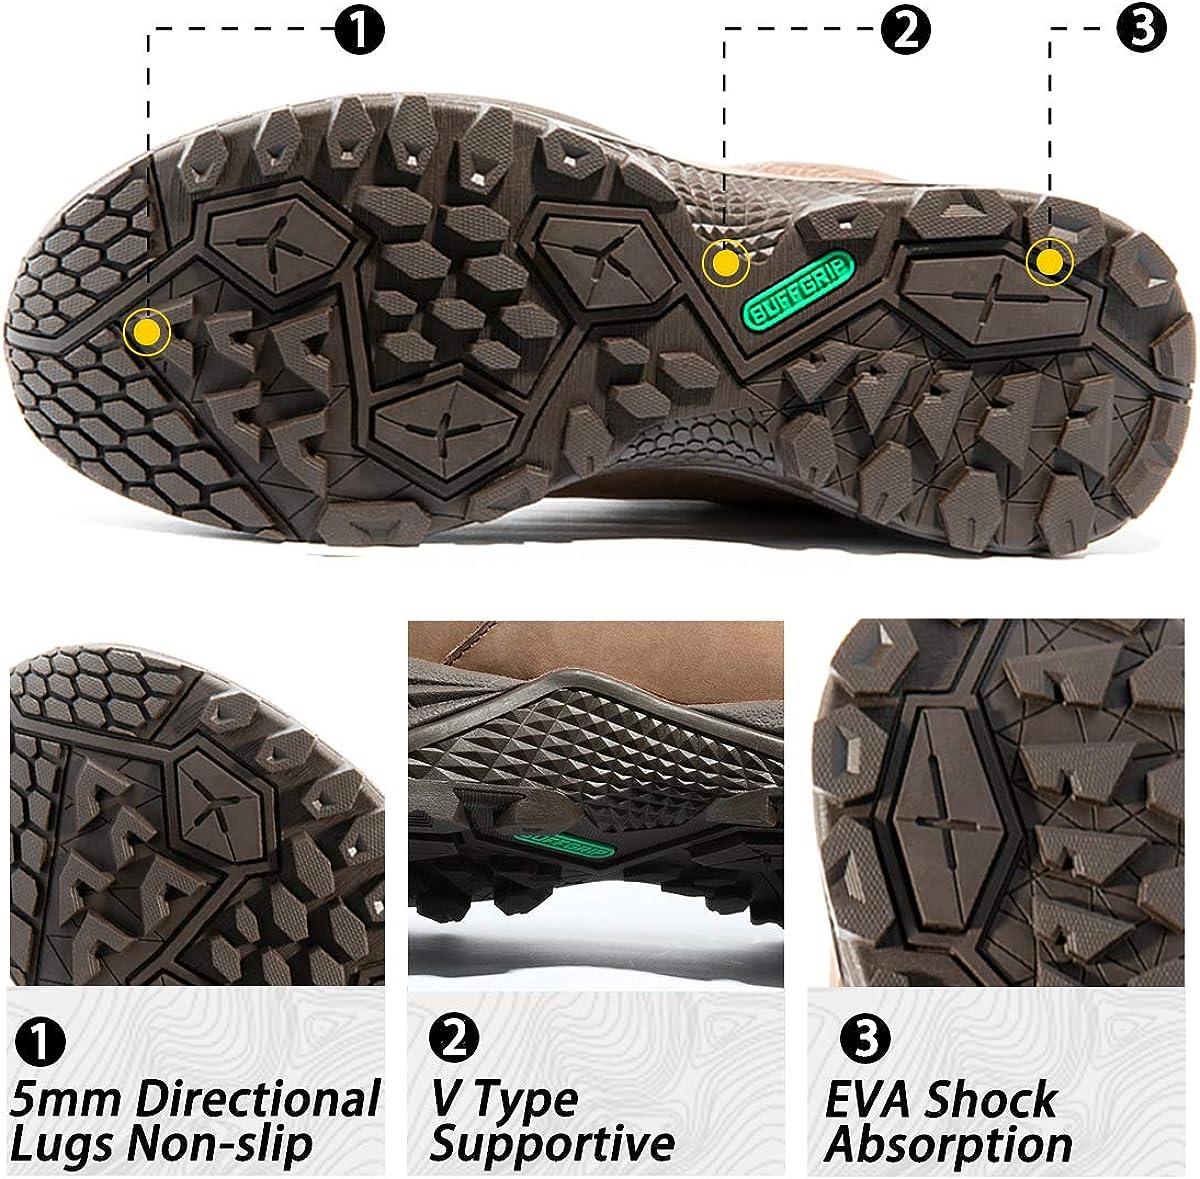 Wantdo Zapatos Seguridad Trekking Senderismo Andar Deportivo Impermeables Trail Calzados Monta/ña Hombre